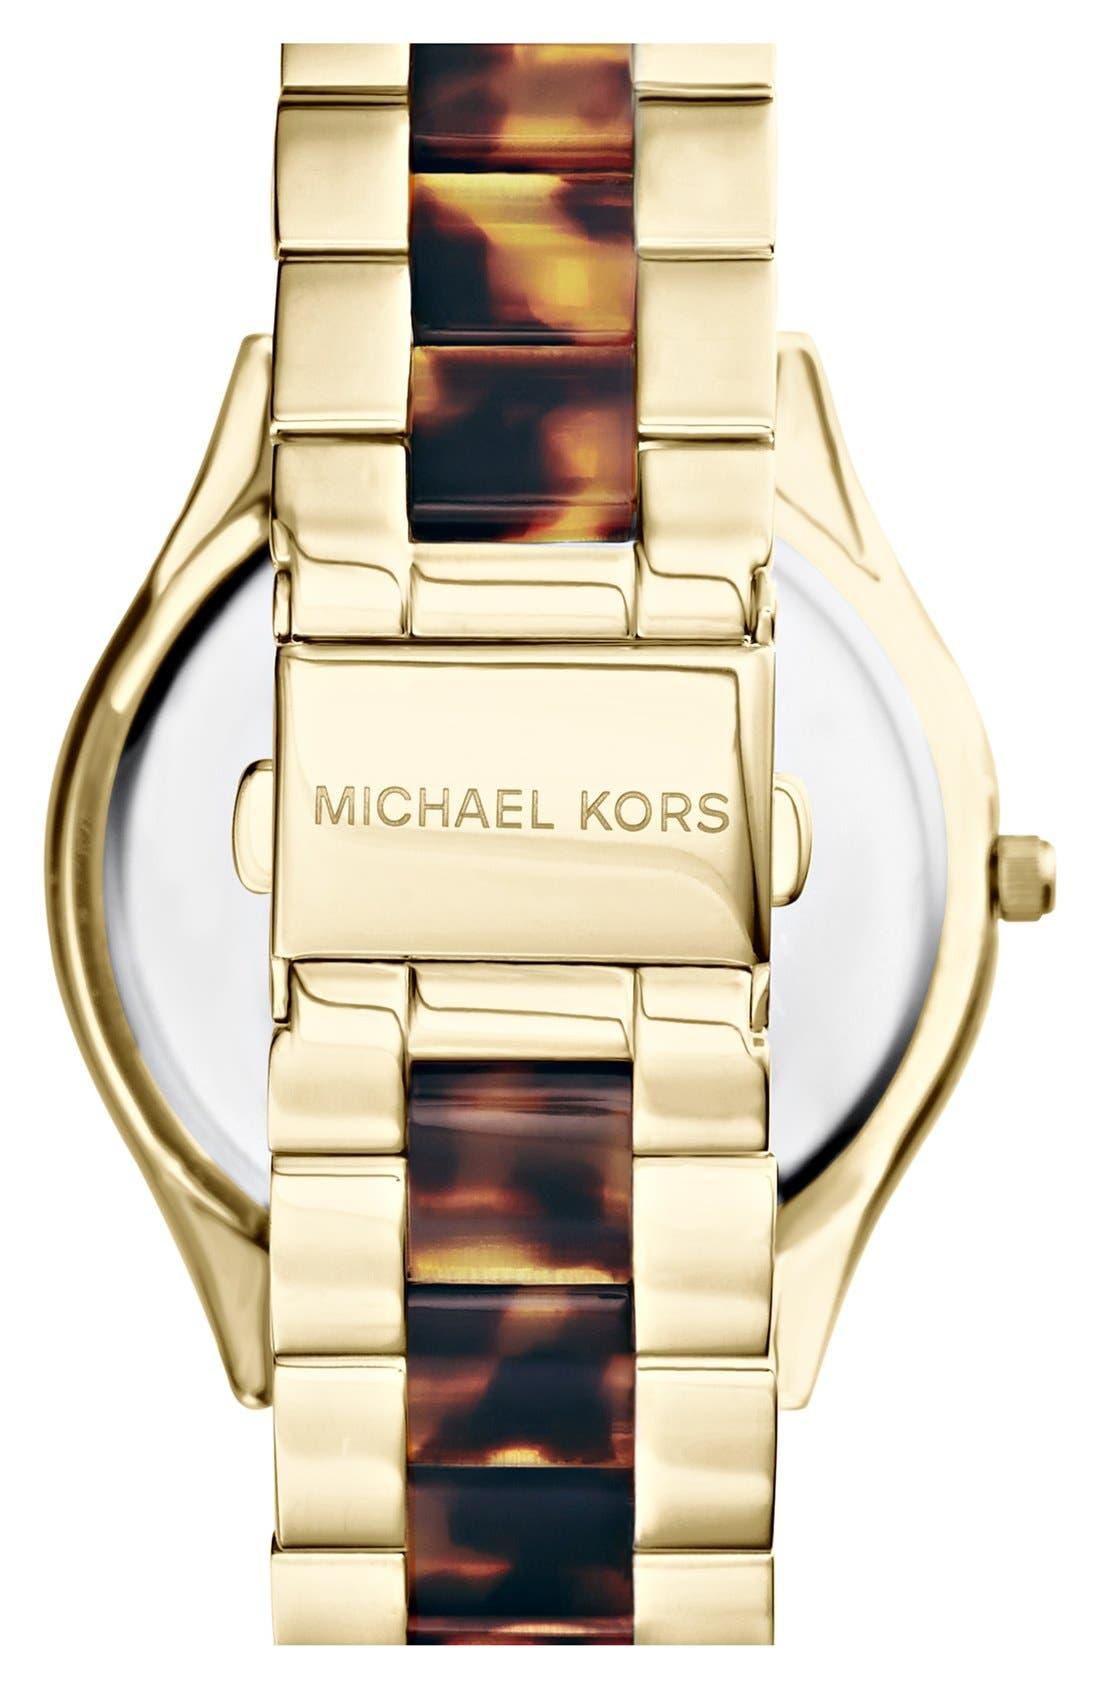 Michael Kors 'Slim Runway' Round Bracelet Watch, 42mm,                             Alternate thumbnail 2, color,                             Tortoise/ Gold